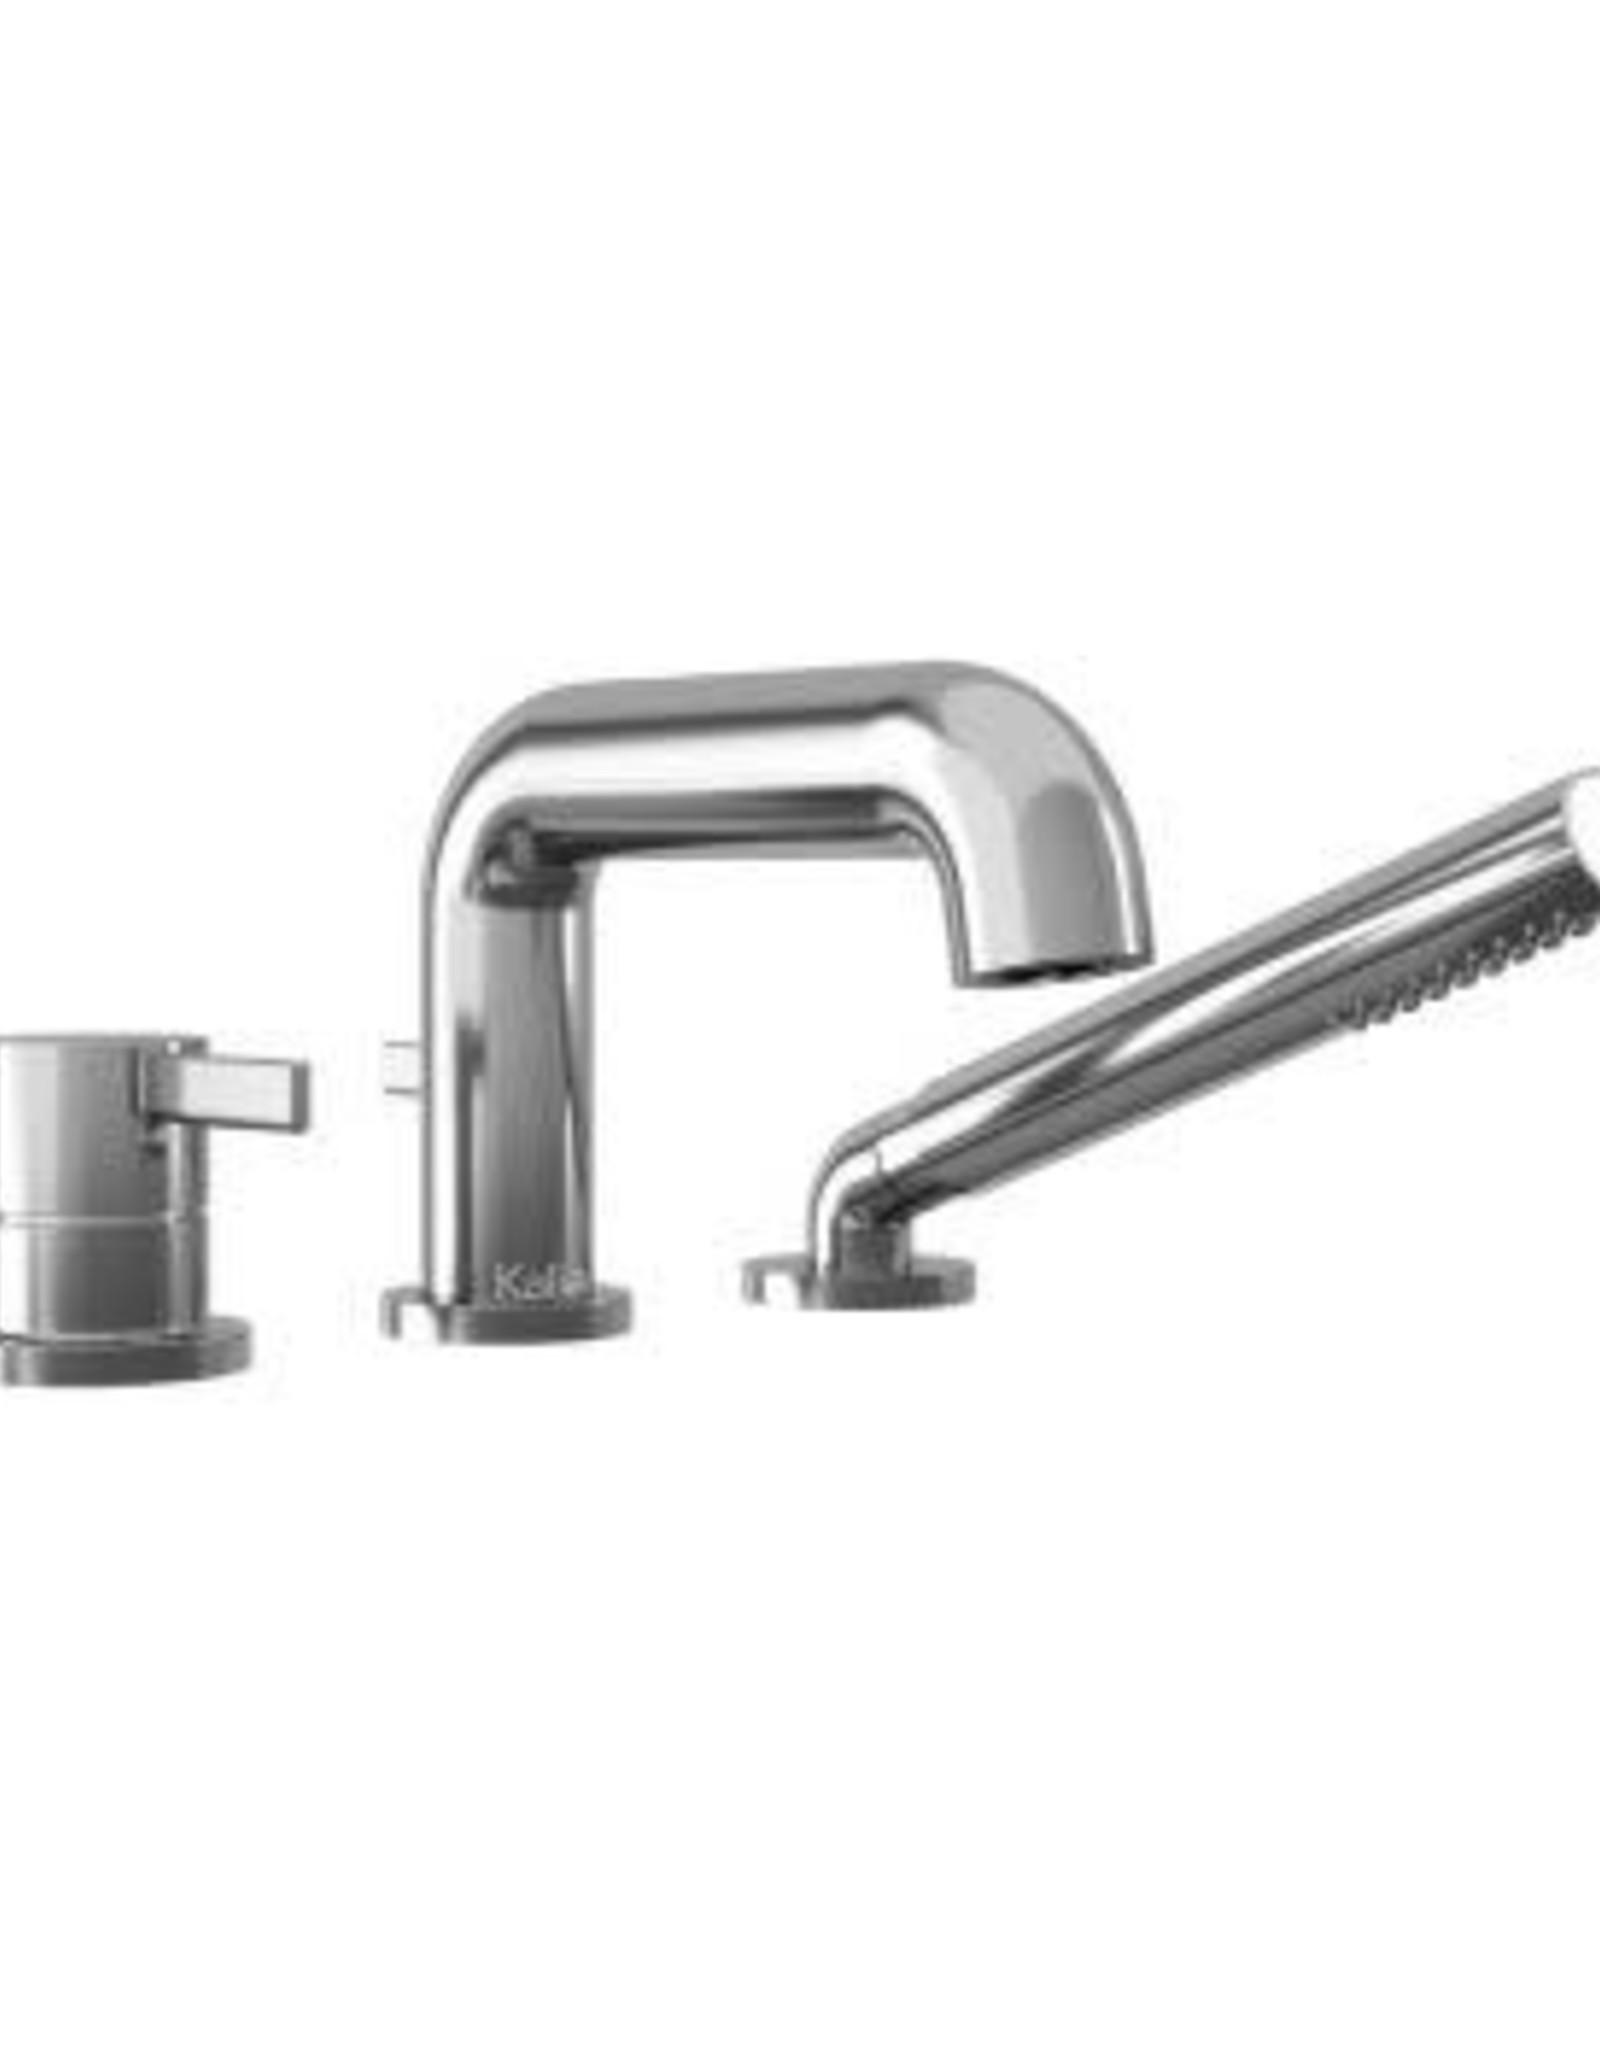 Kalia Kalia Basico Deckmount Tub Filler w/ Handshower w/ R.I.- Chrome